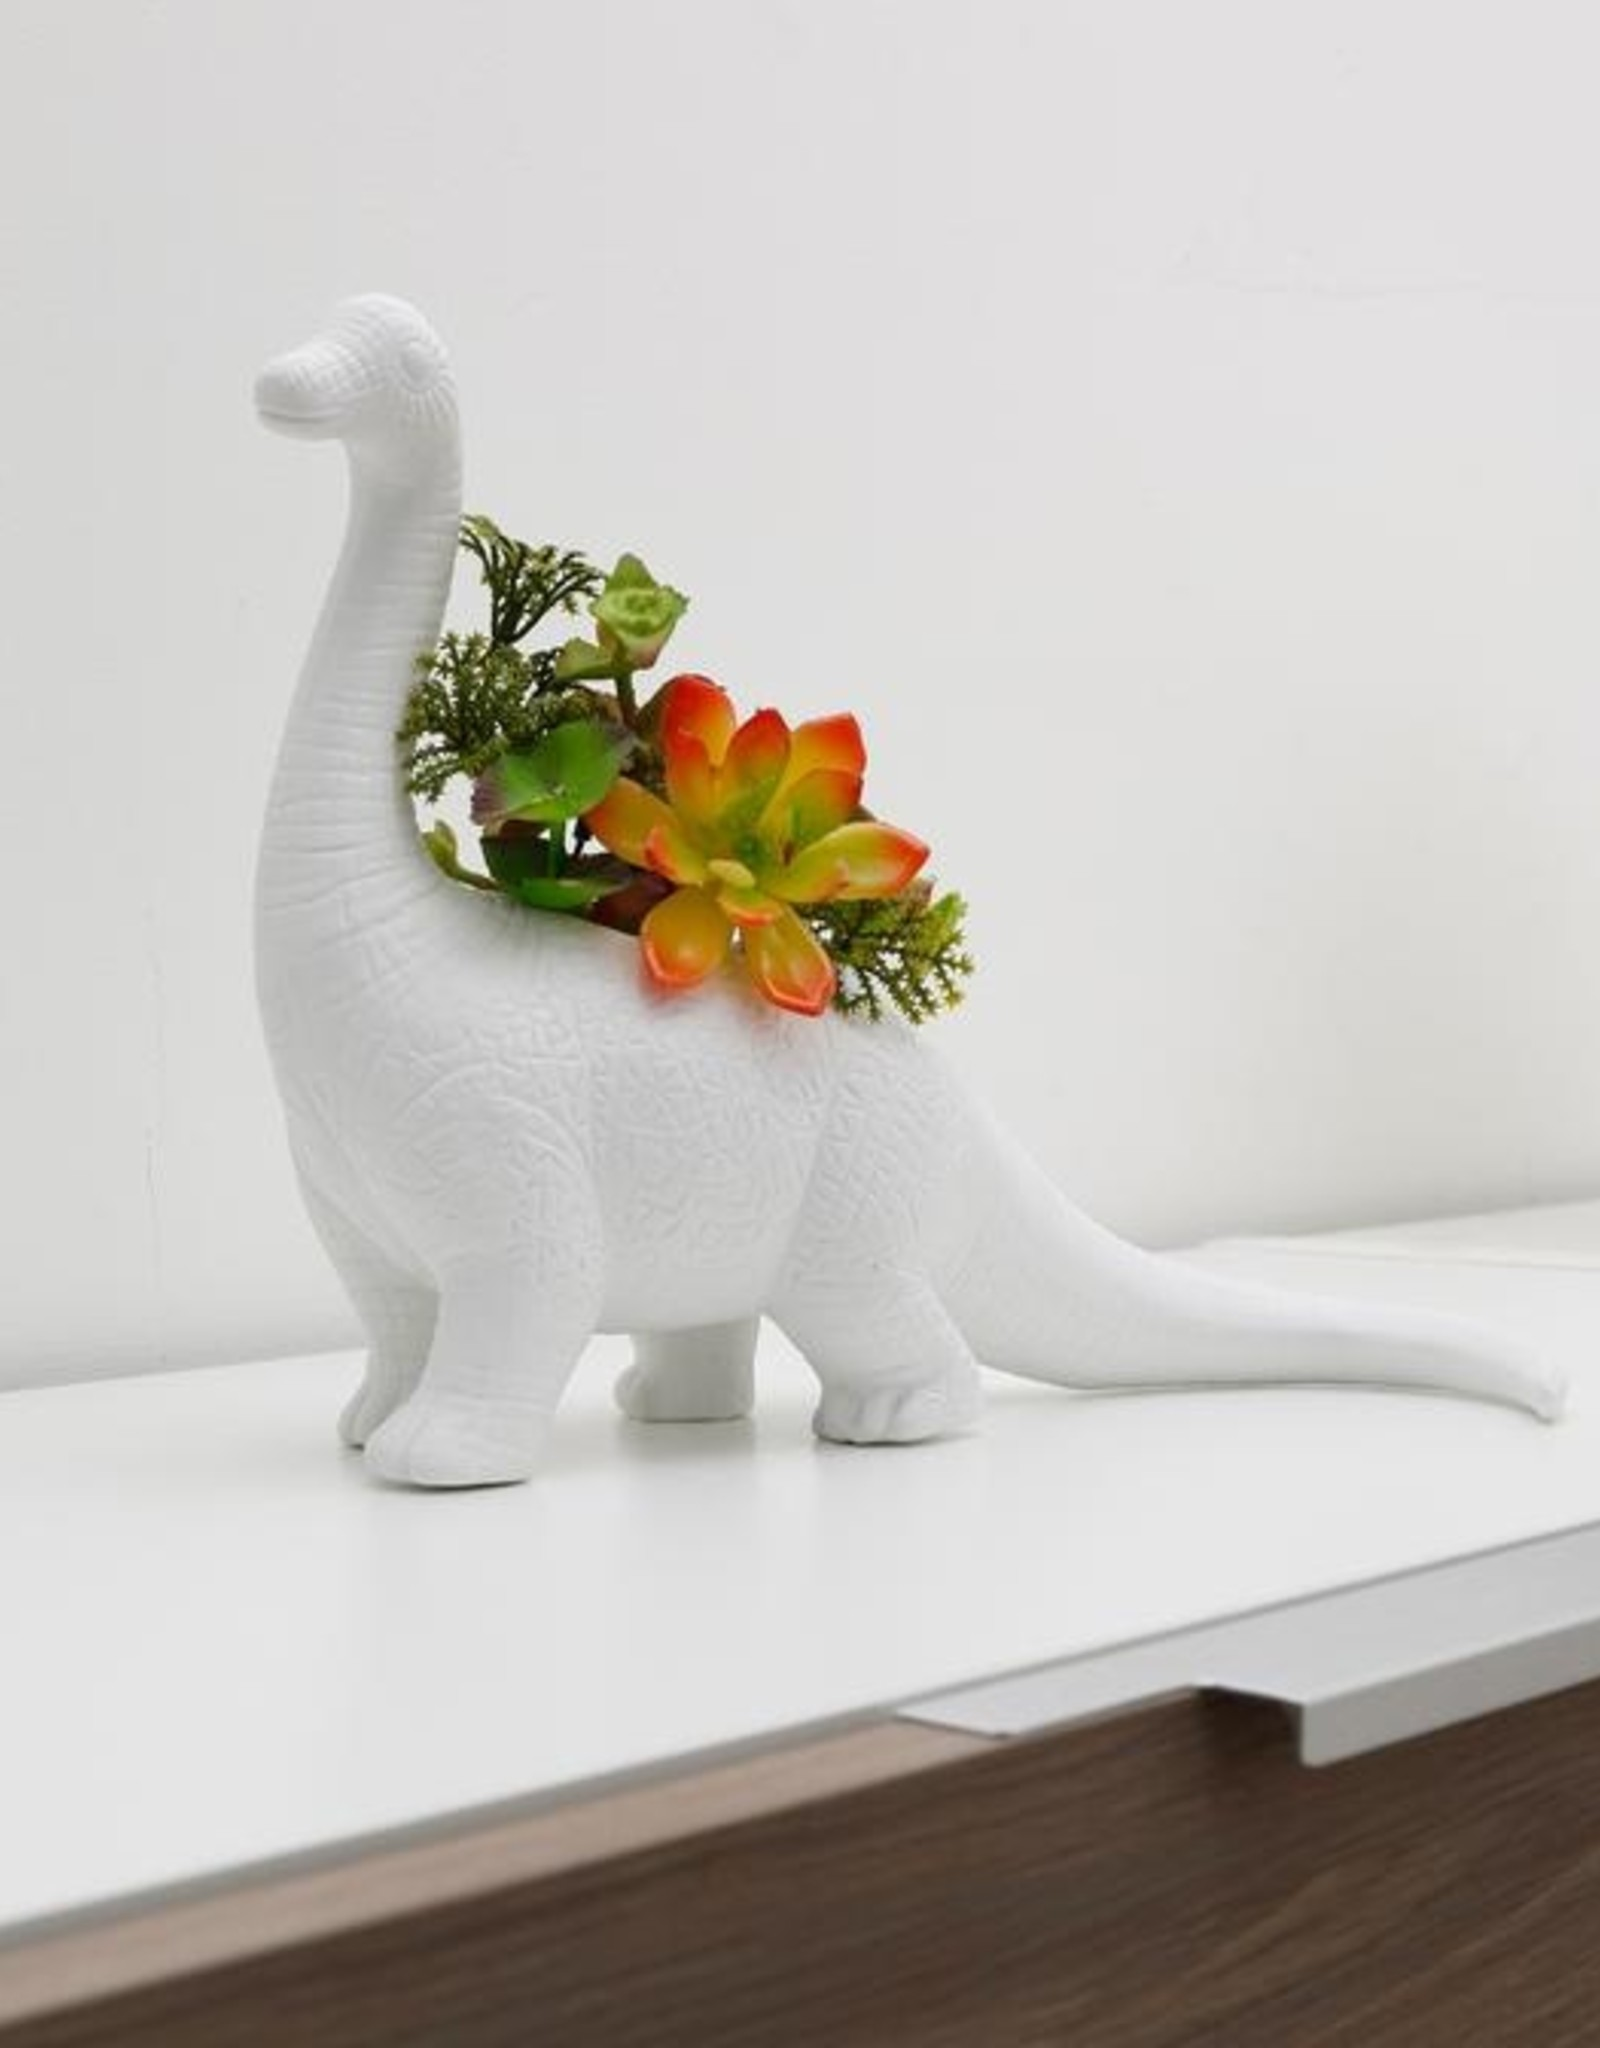 Kikkerland Aplantosaurus